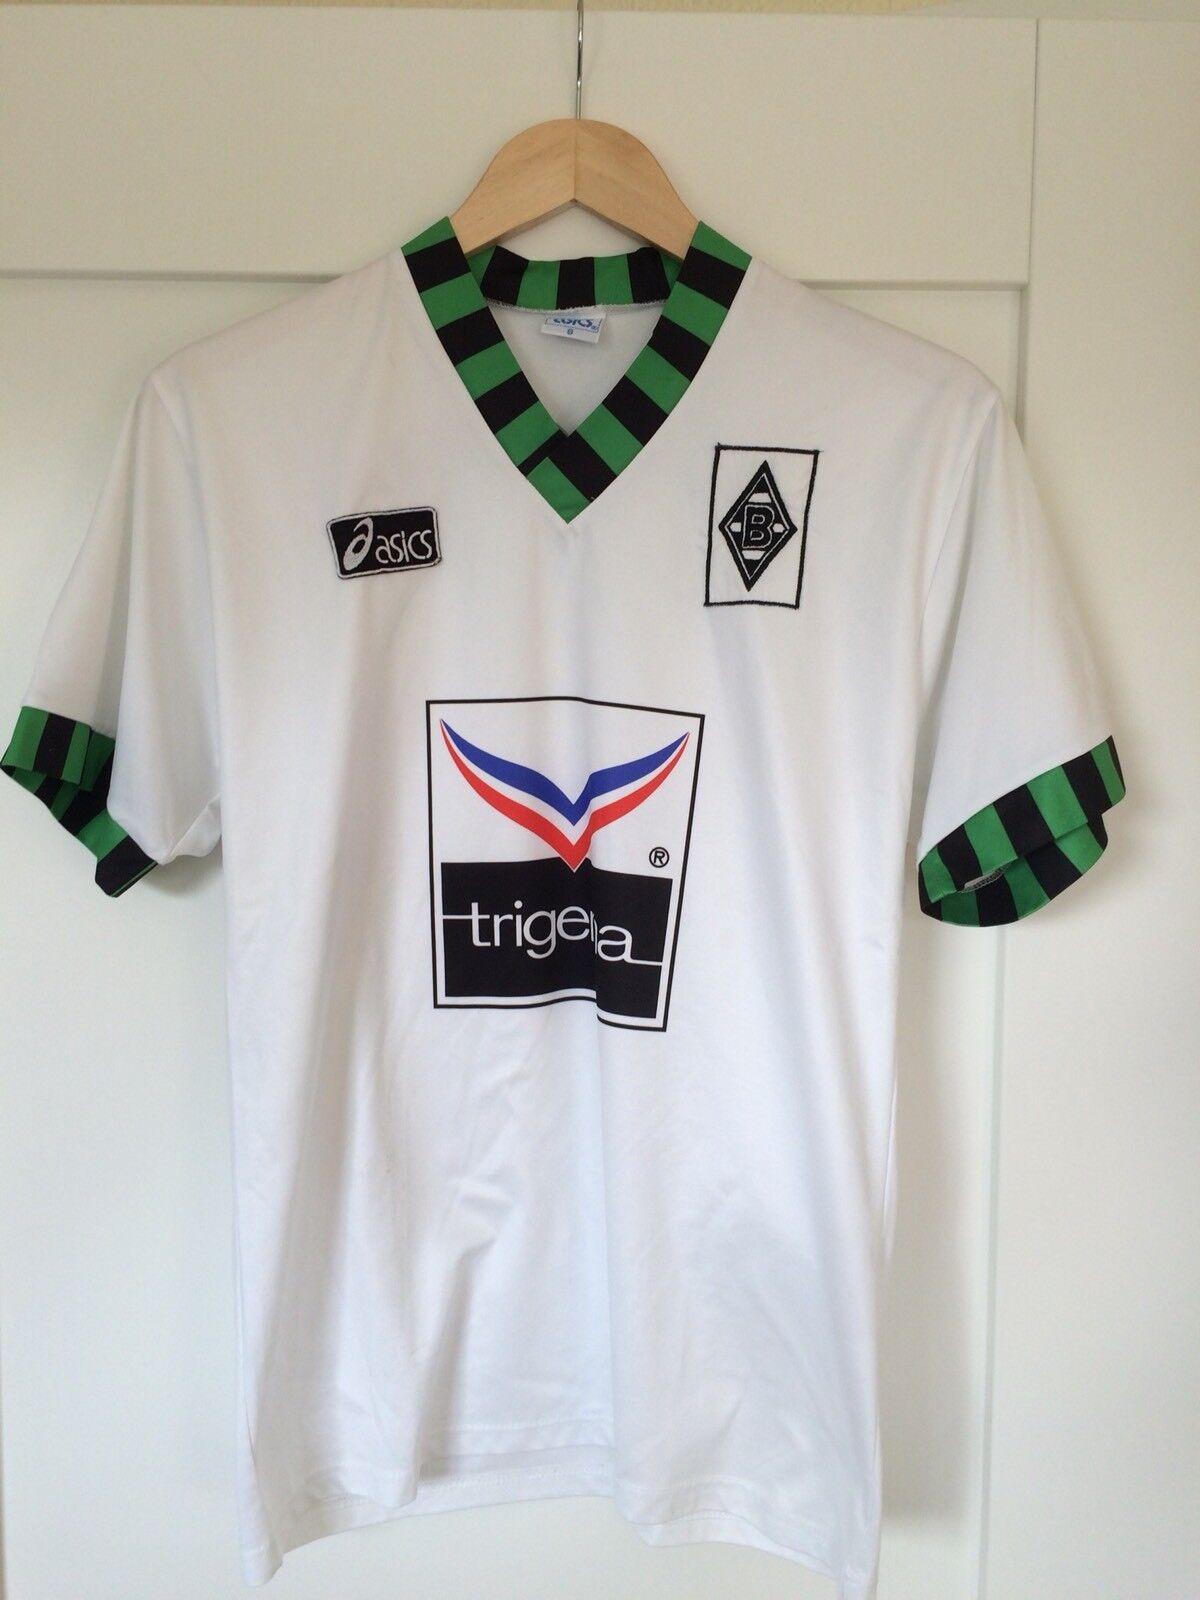 Borussia Mönchengladbach Trikot von ASICS, Trikotsponsor Trigema, Gr. S